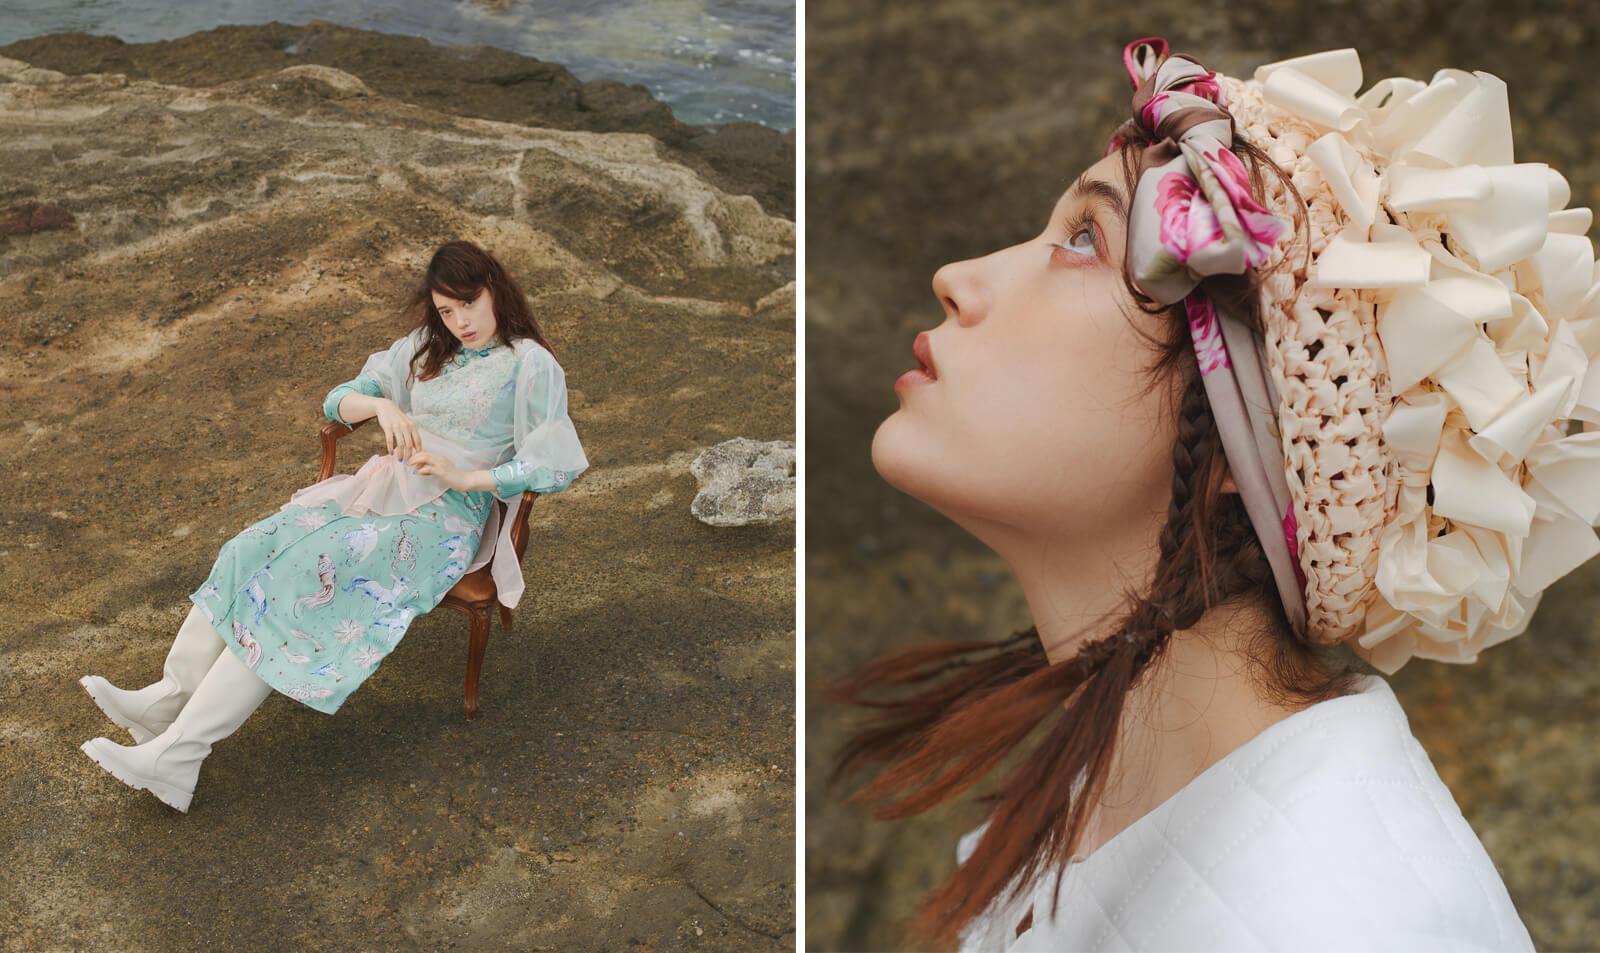 Encounter|Jin Yamamoto & Kosuke Hirose